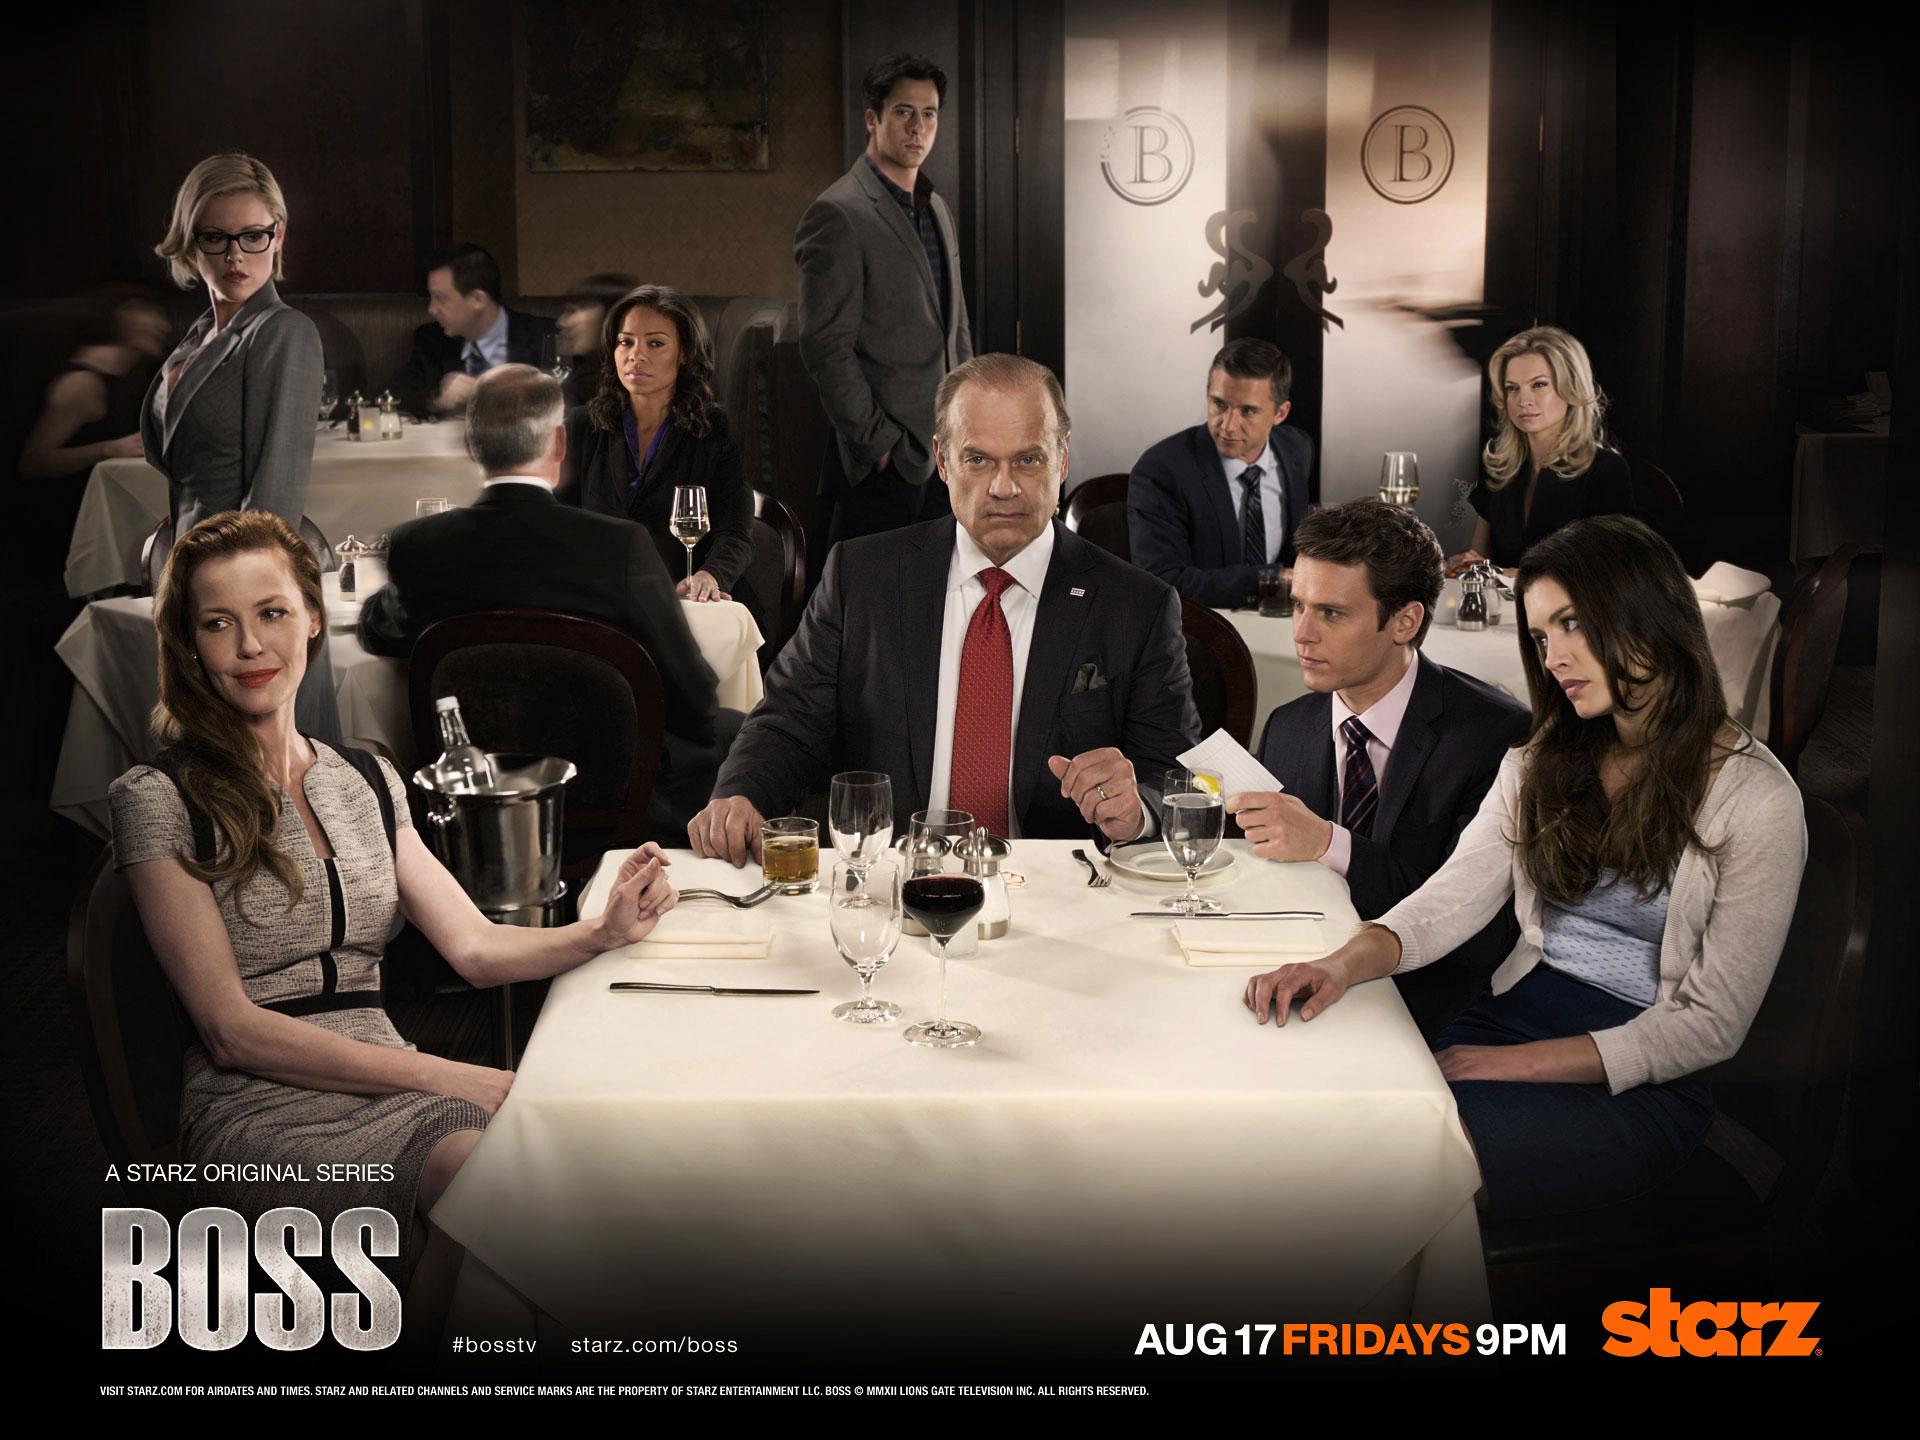 bosss022.jpg